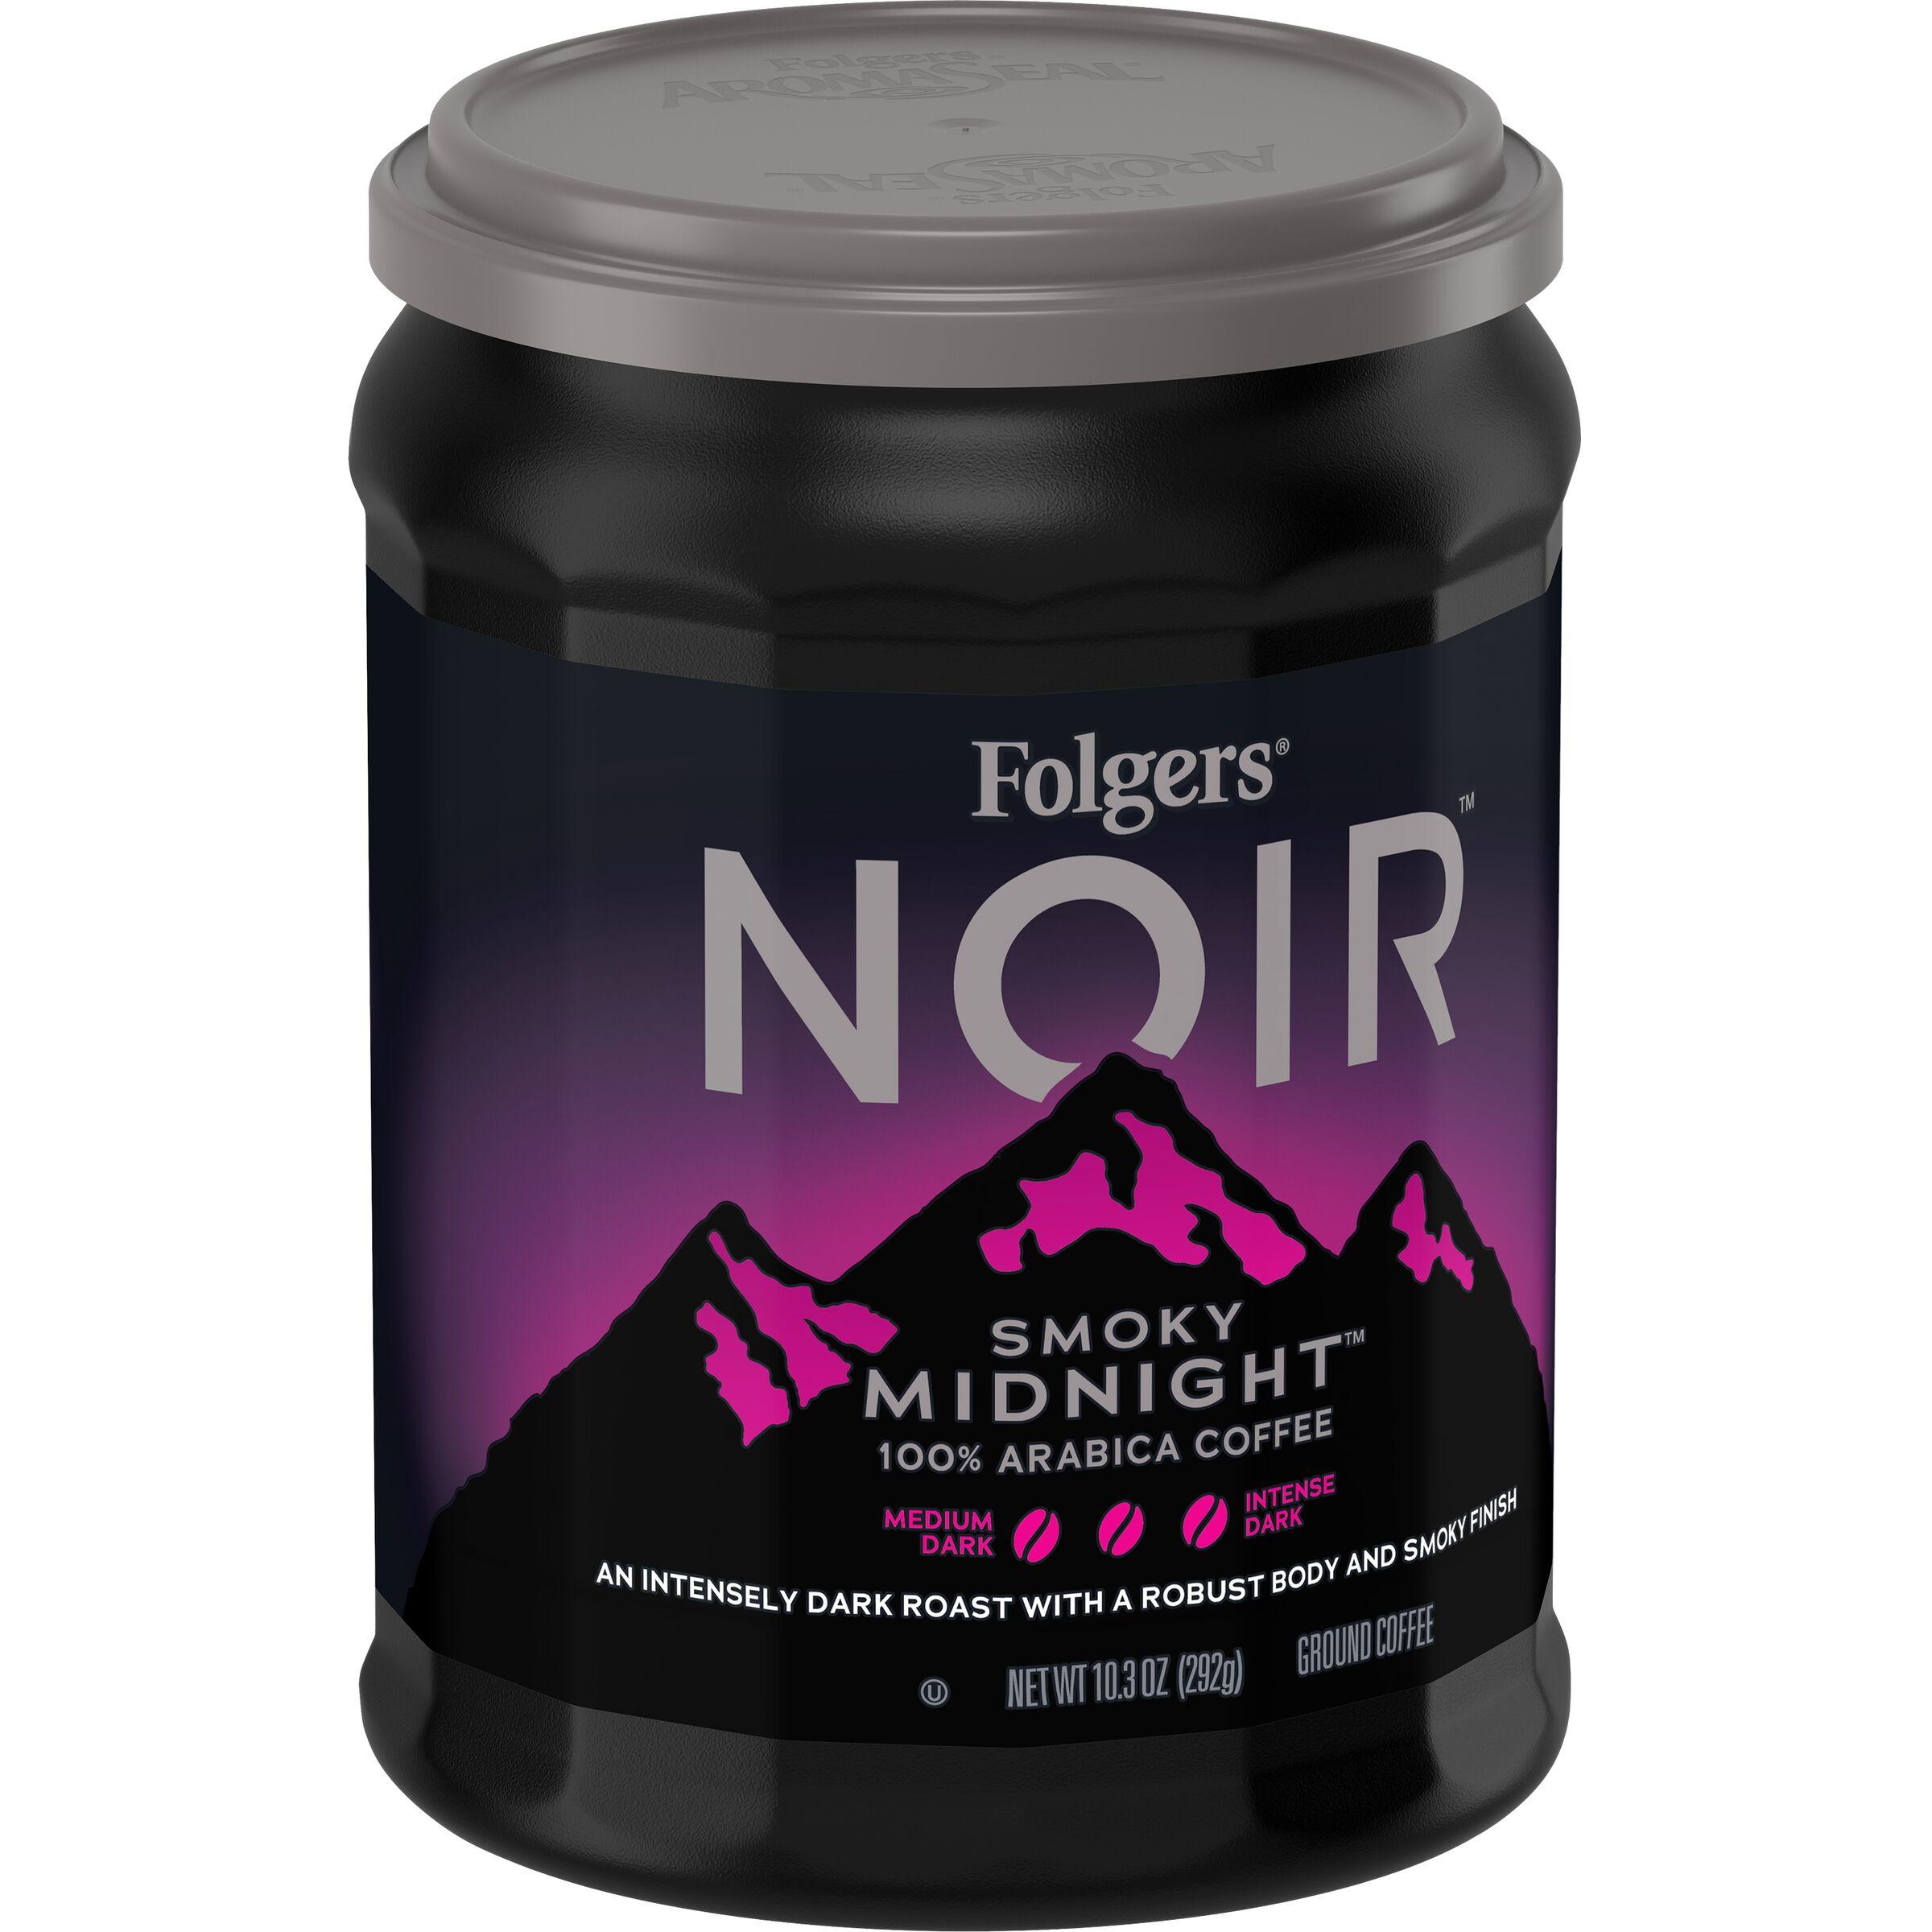 Folgers Noir Smoky Midnight Ground Coffee